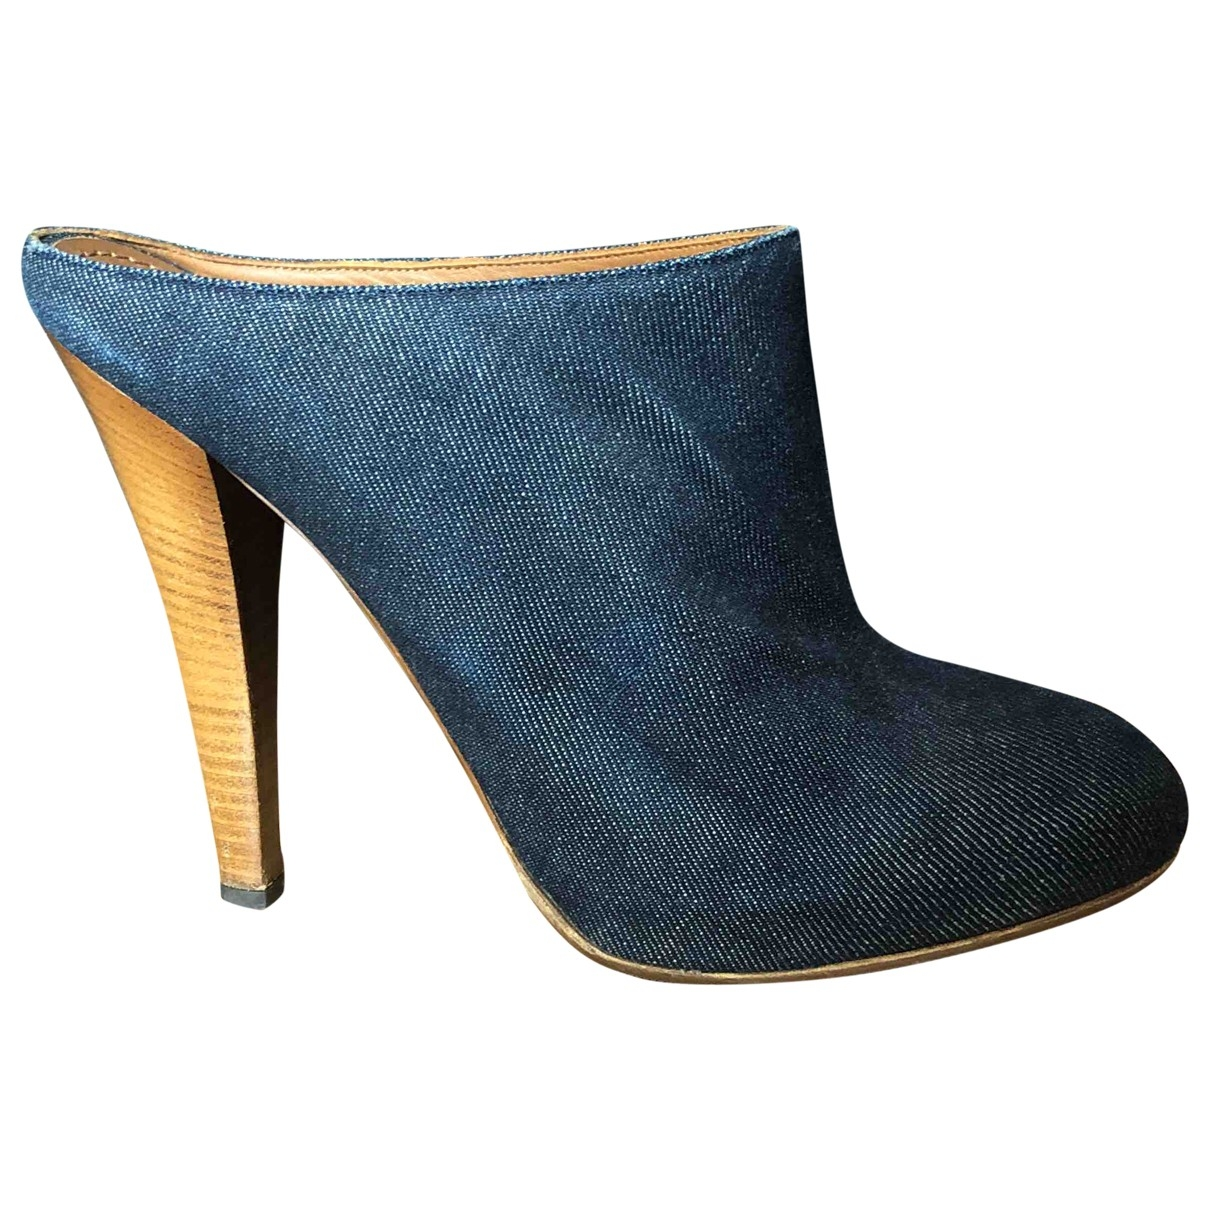 Yves Saint Laurent \N Stiefeletten in  Blau Leinen